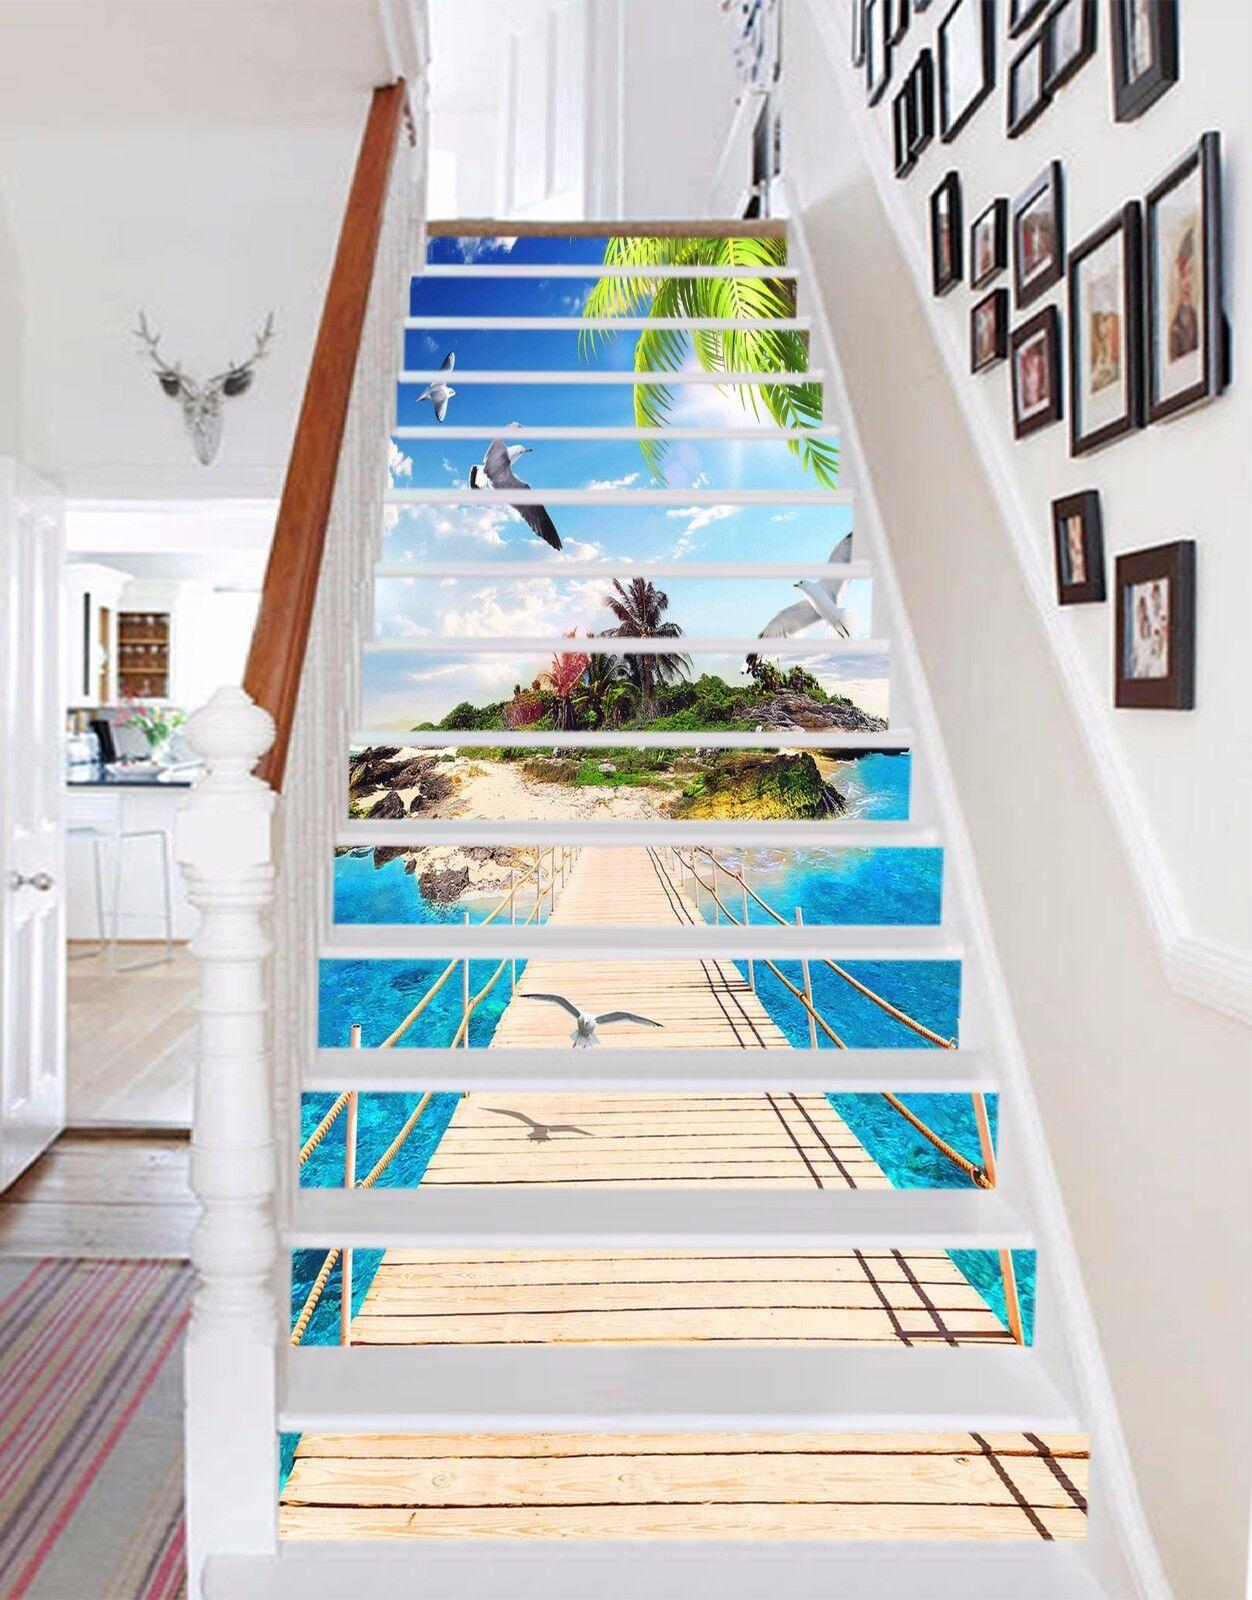 3D Island Bridge Sea 5735 Risers Decoration Photo Mural Vinyl Decal Wallpaper CA